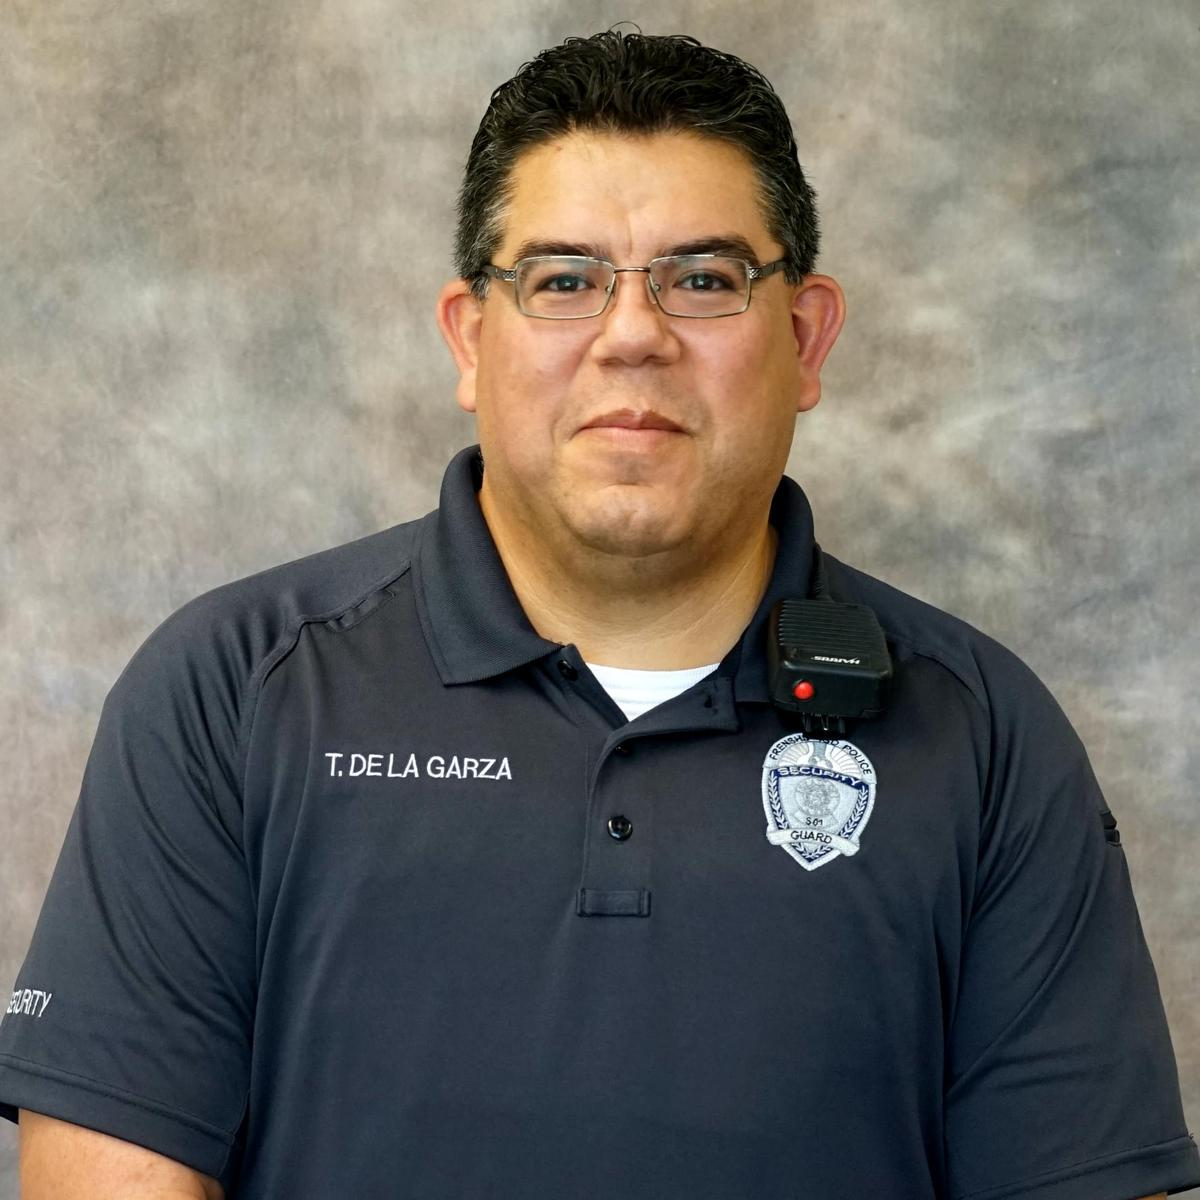 Tony De La Garza